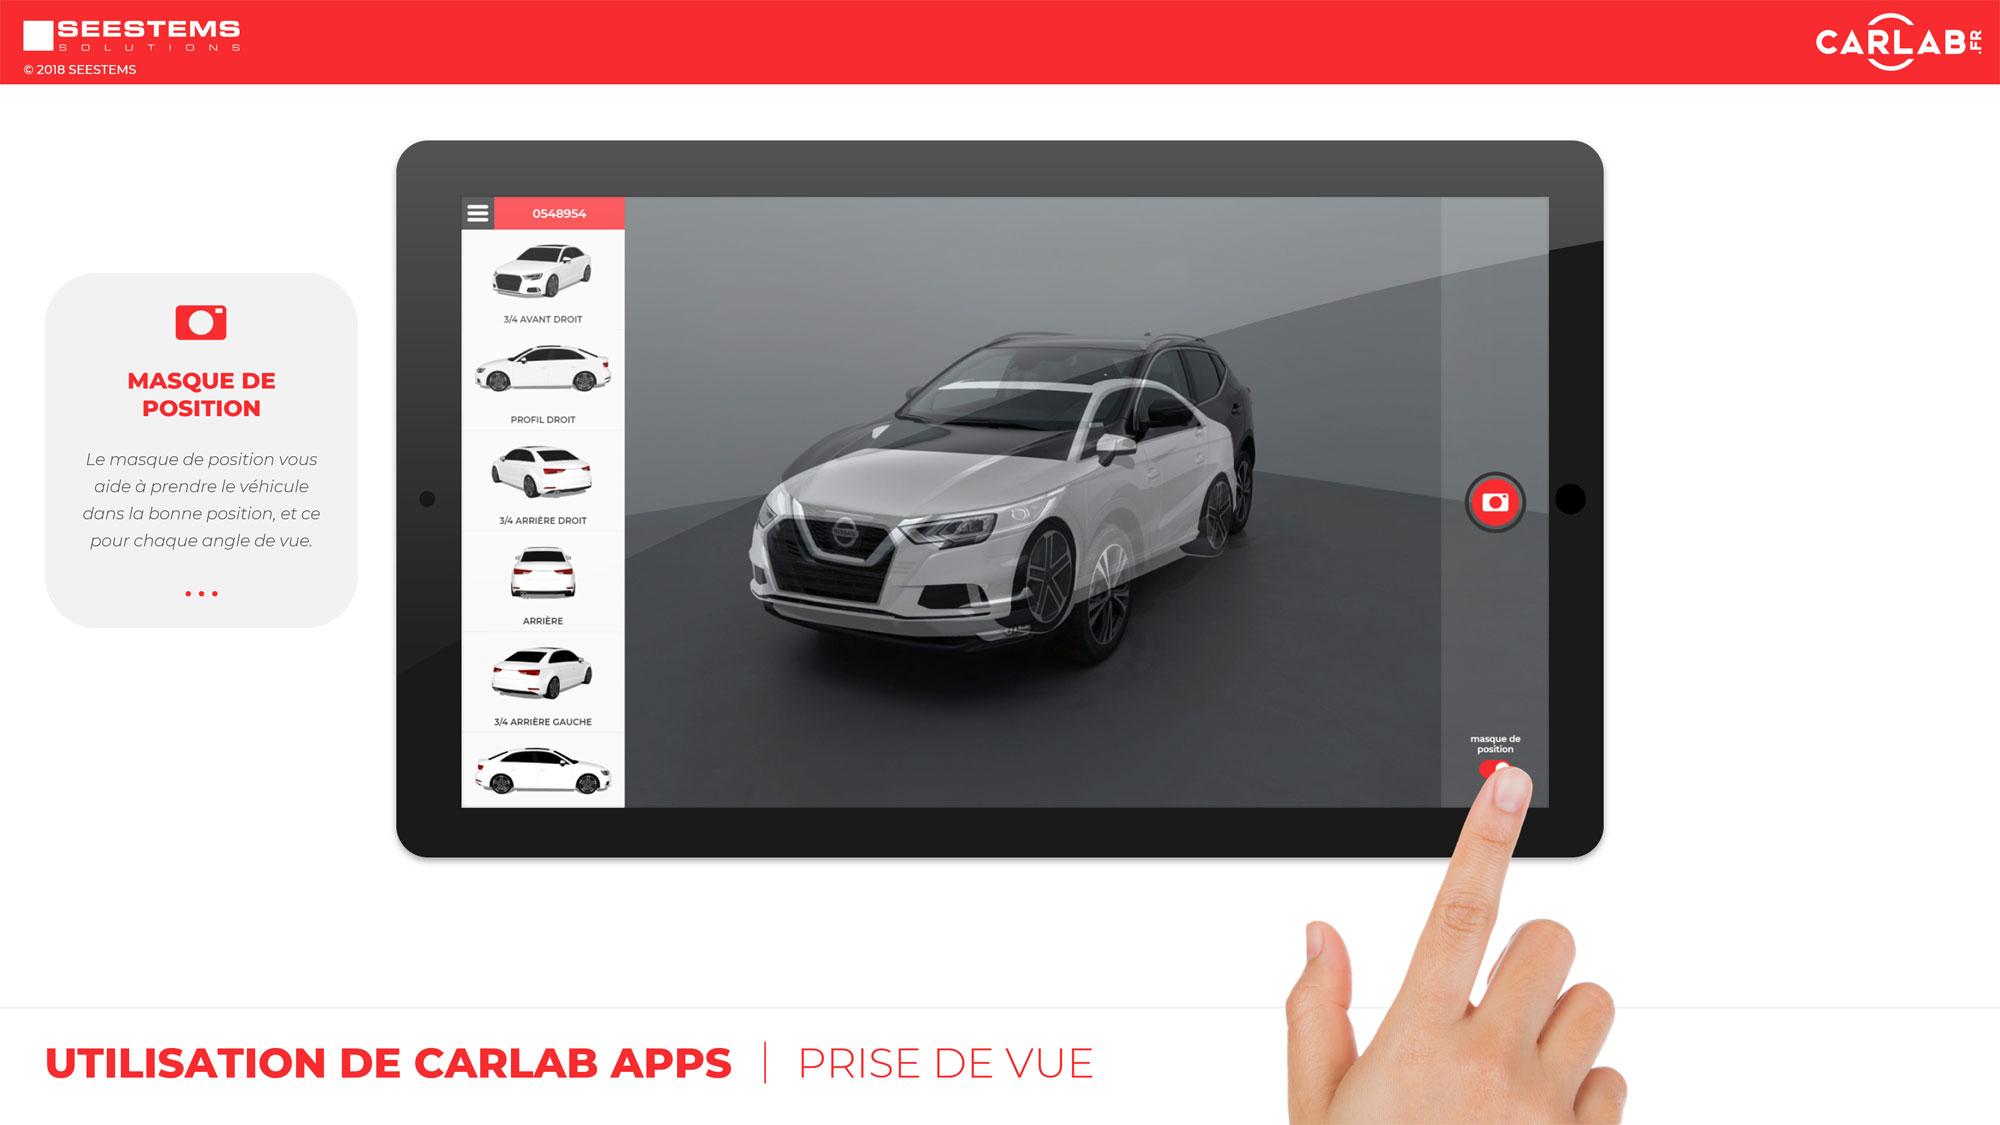 img capture mycarlab photo voiture mobile